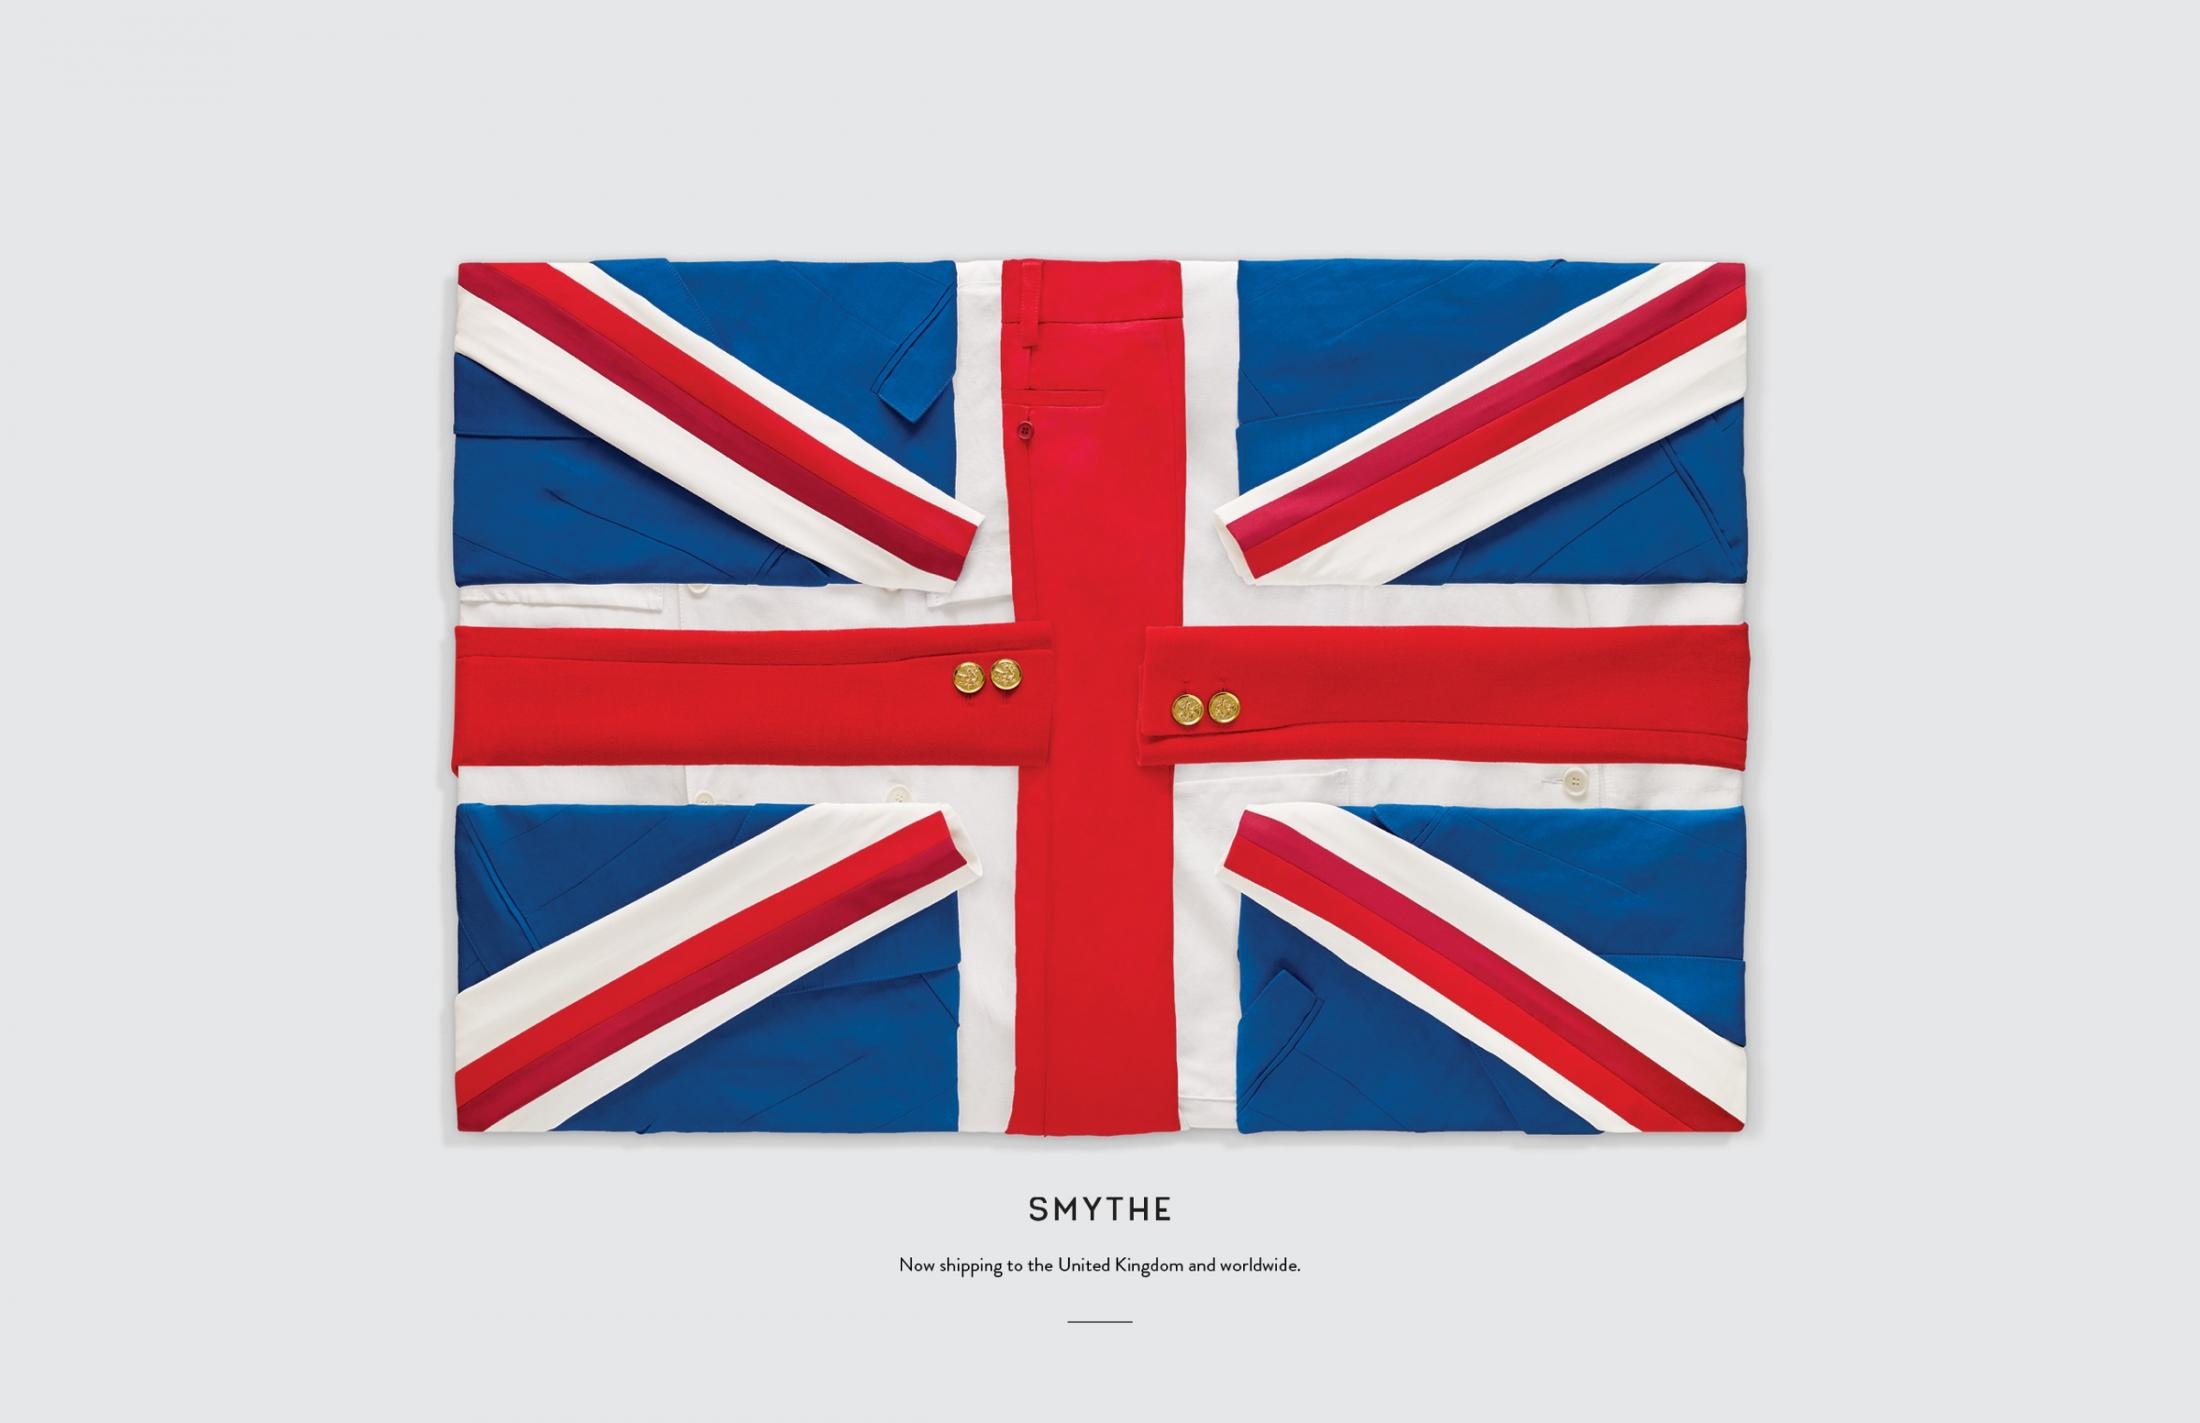 Smythe Print Ad - Flags, UK